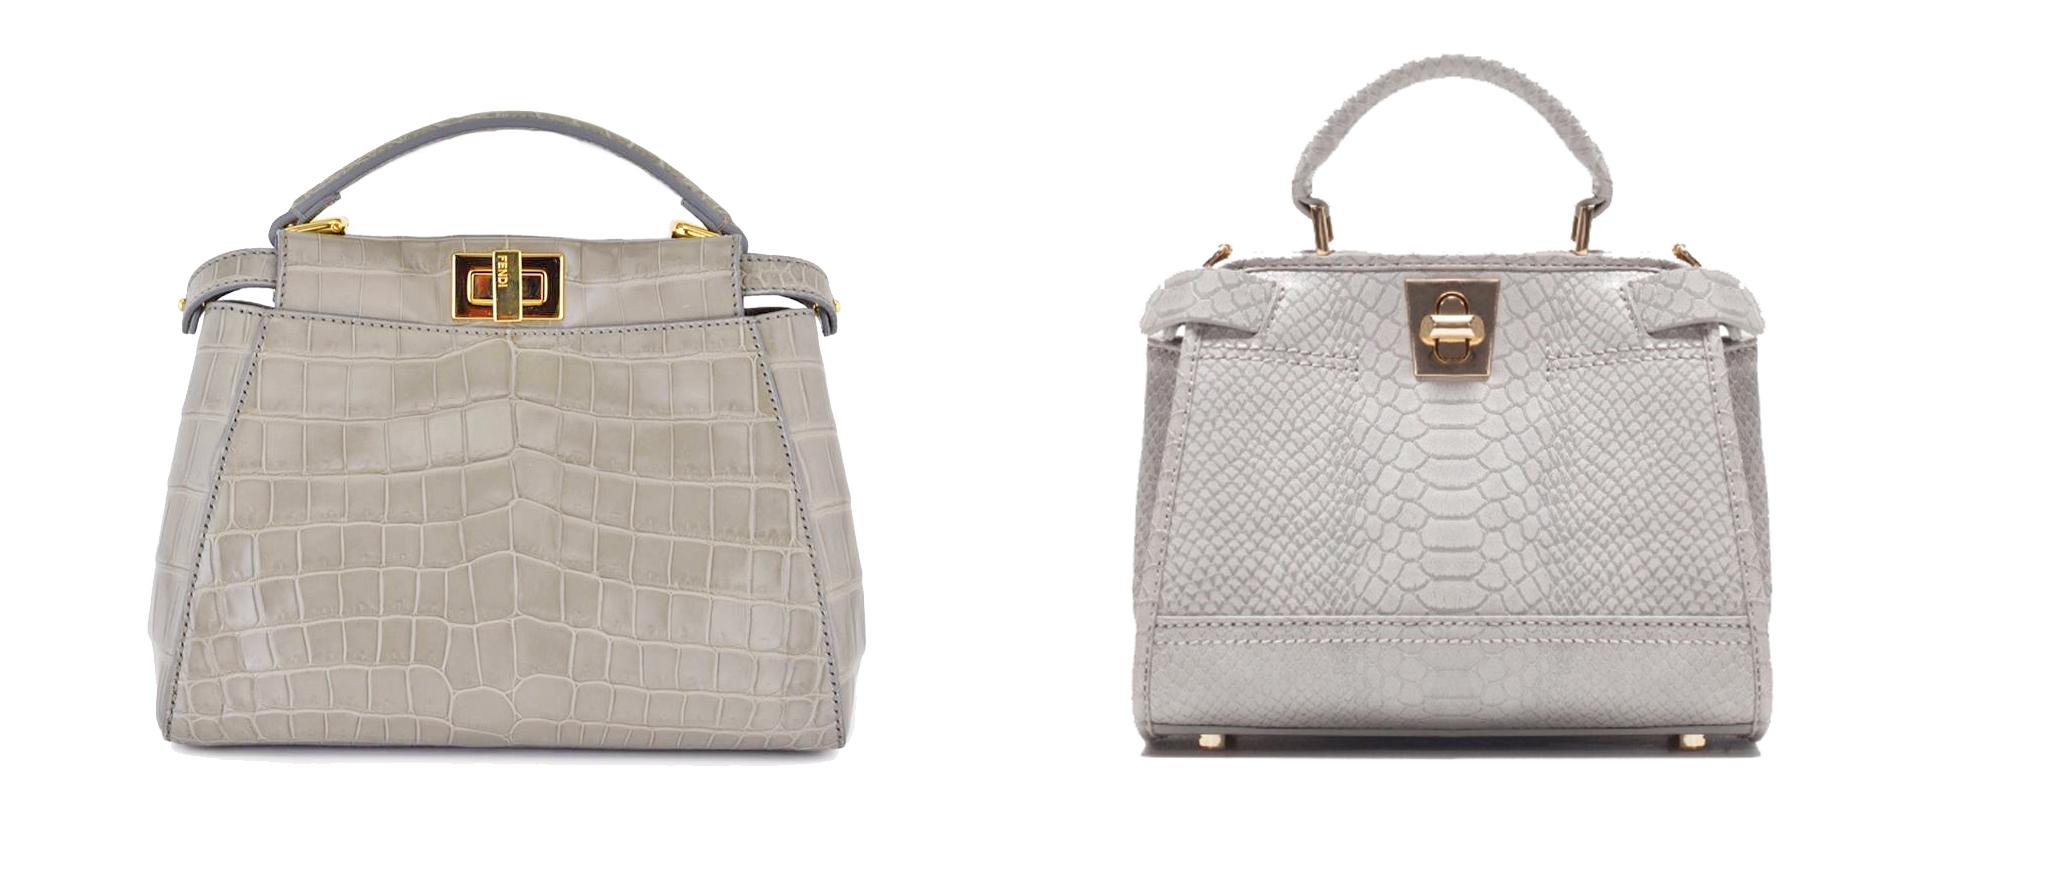 Gray grey crocodile Peekaboo Micro Satchel 17 000€  vs/ Mini sac city a double anse Zara 40 €